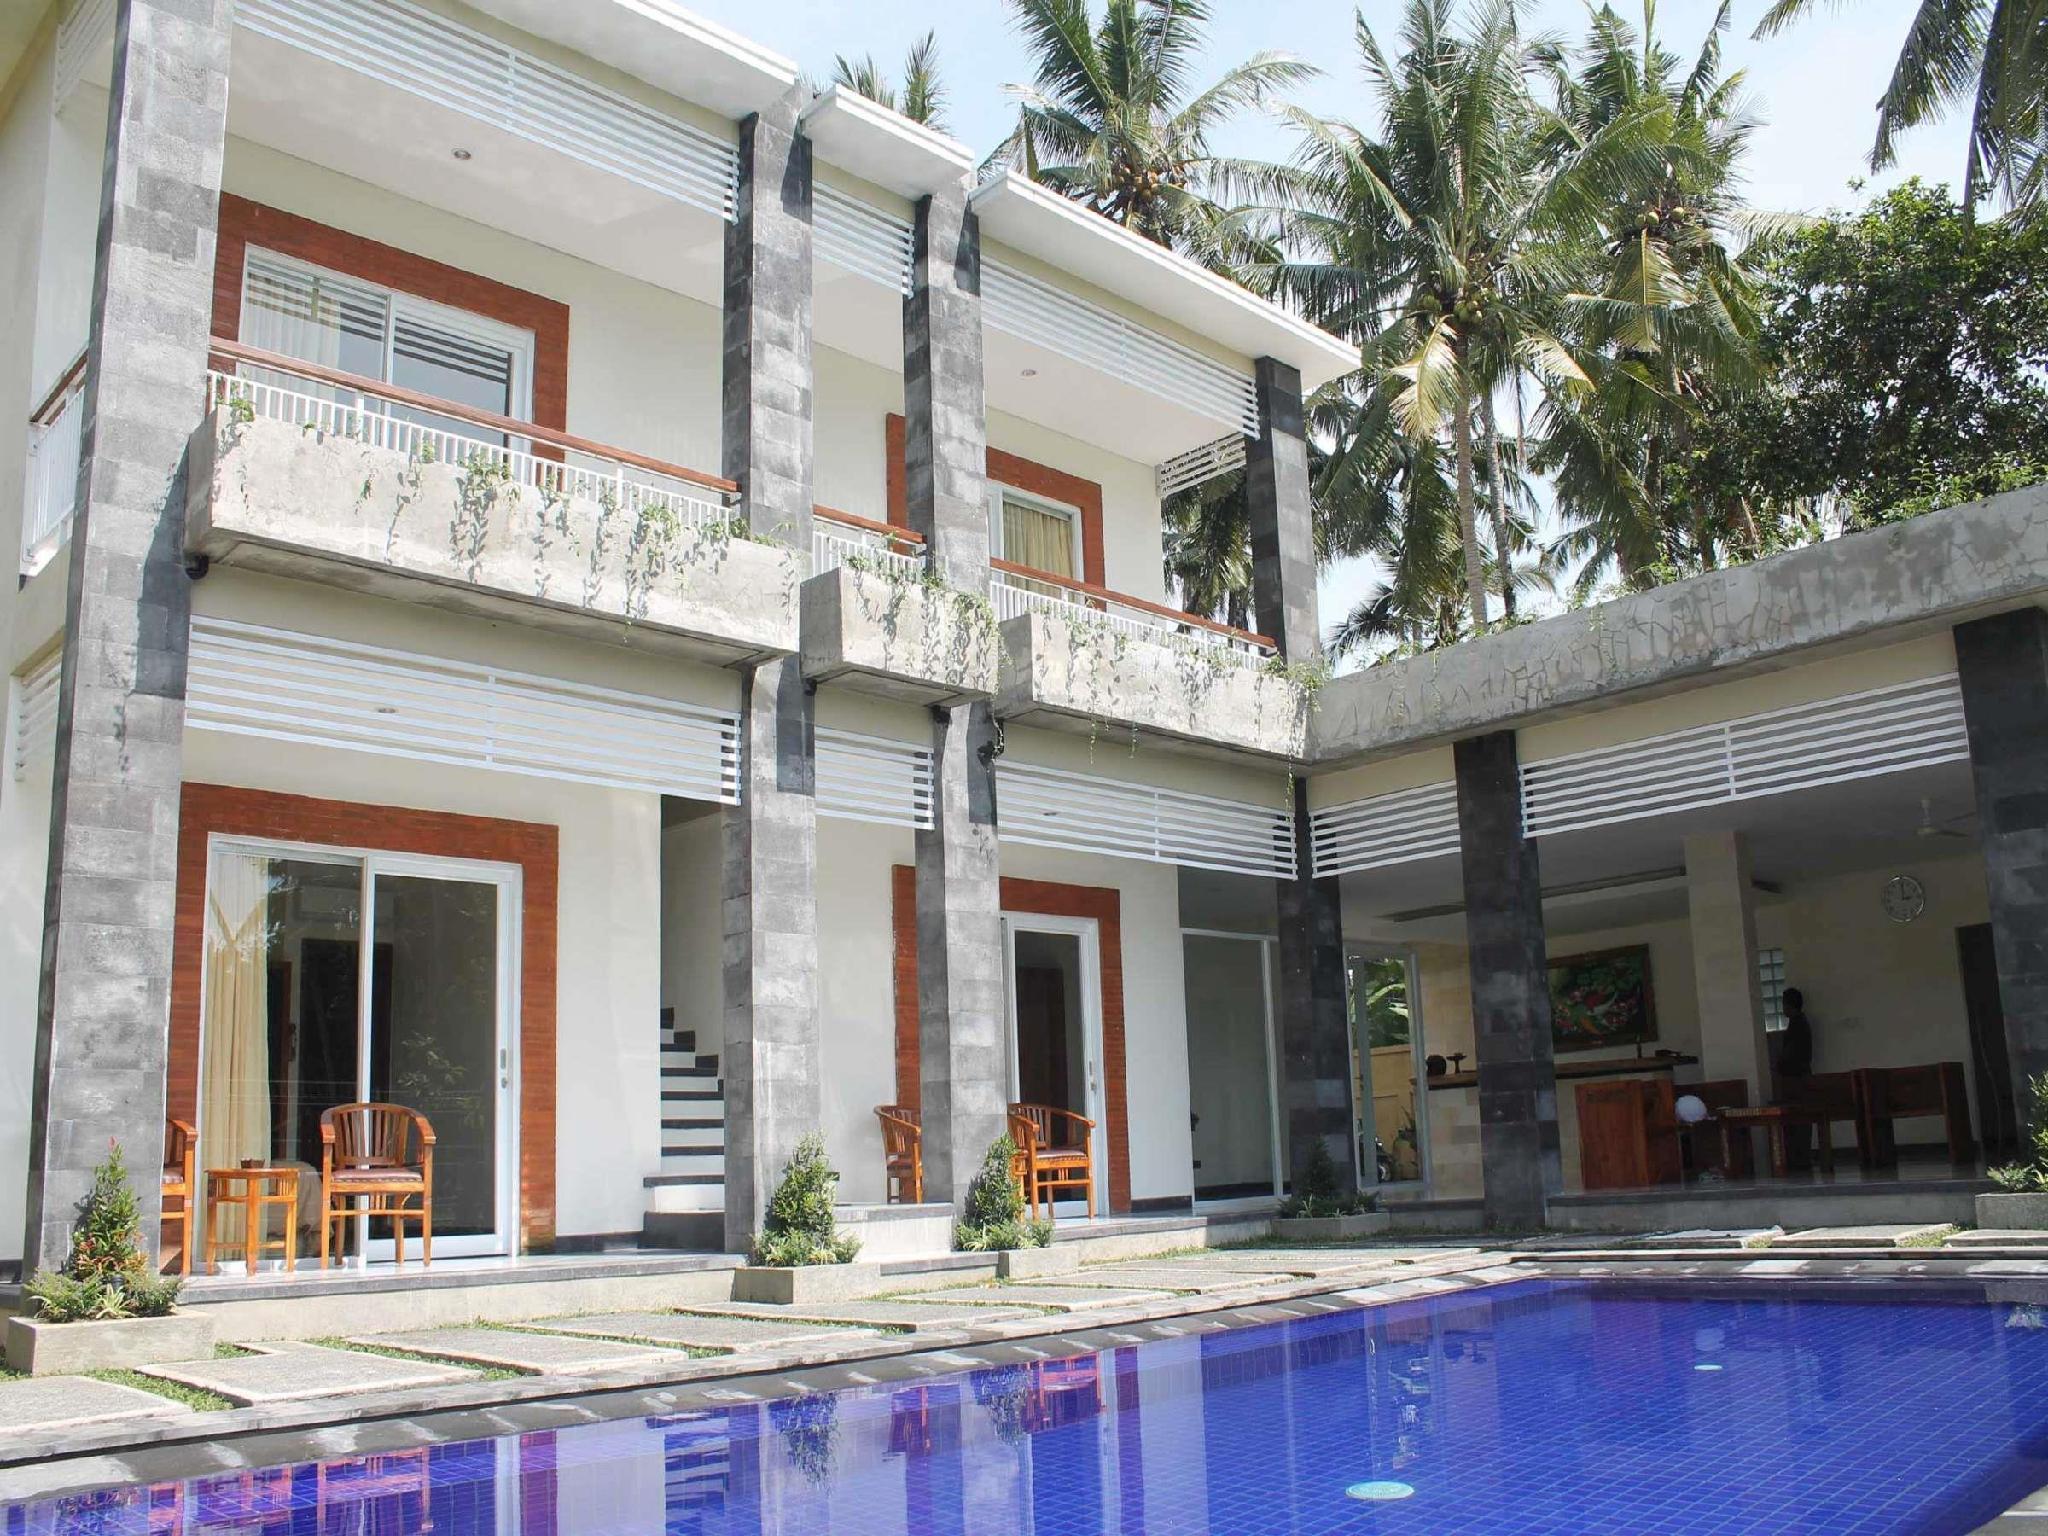 Hotel Long Lane Villa - Banjar Tatiapi Kelod, Pejeng Kawan - Bali